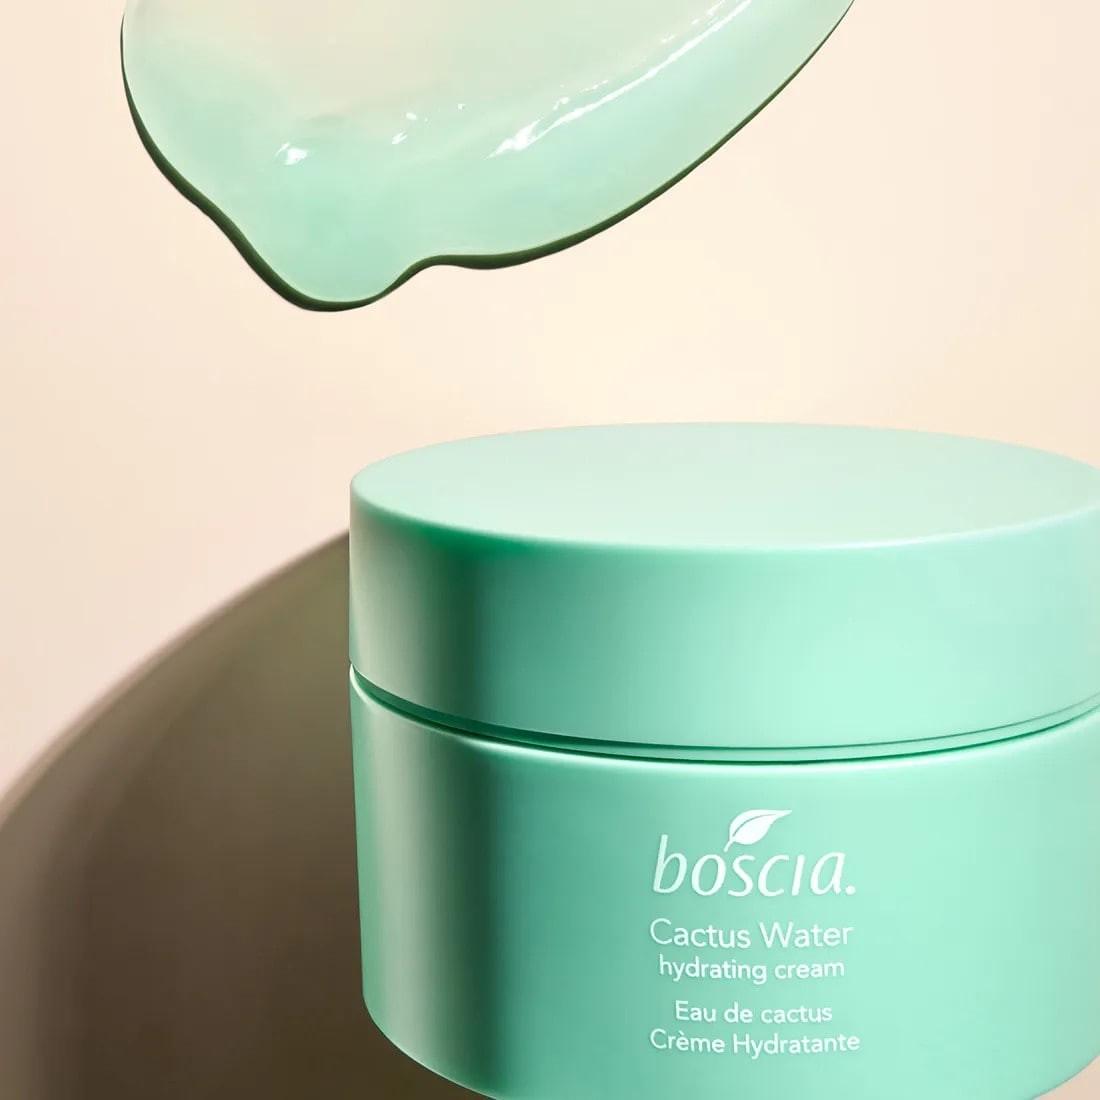 boscia hydrating cream